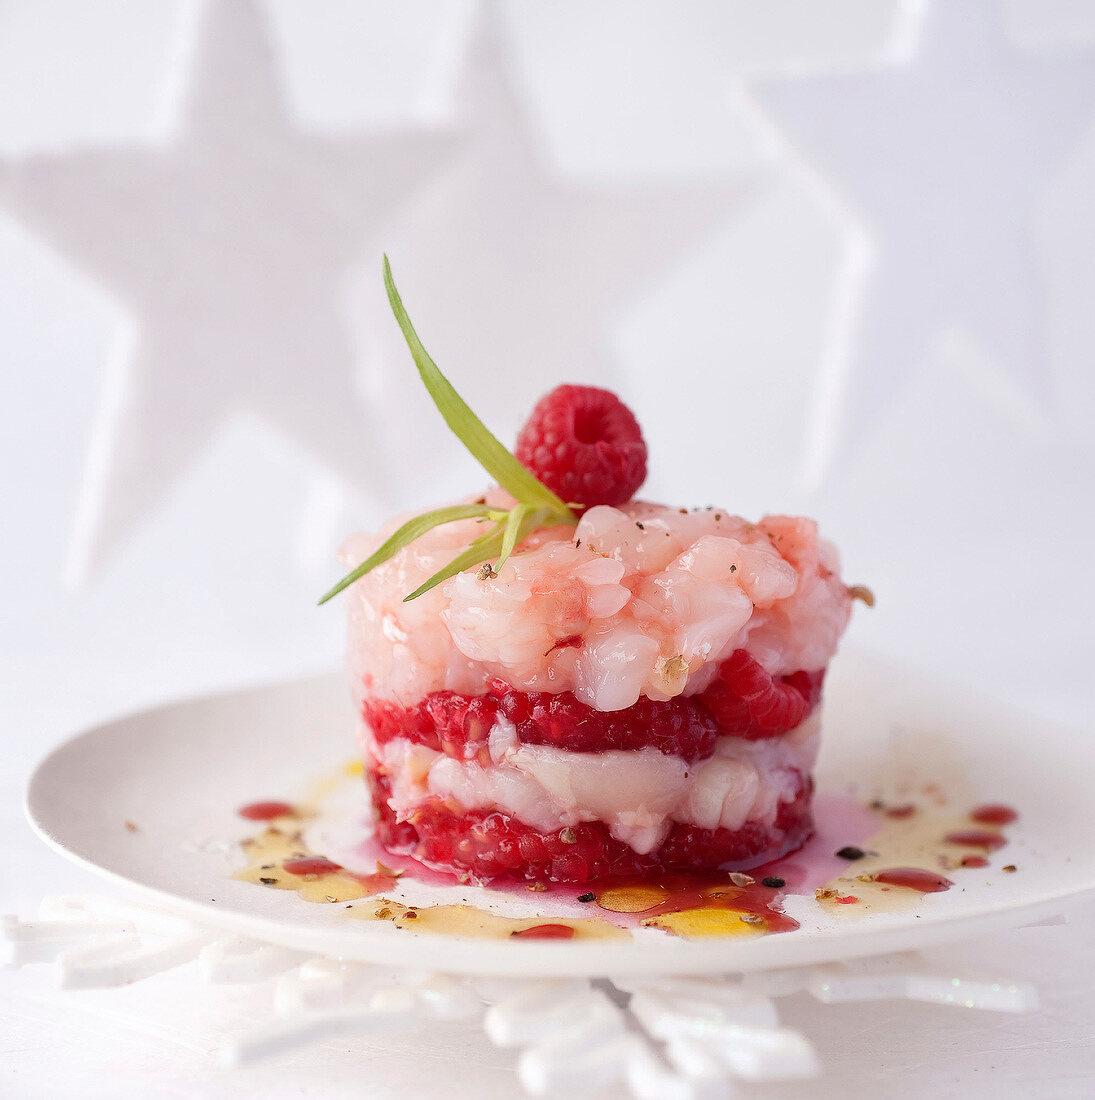 Dublin Bay prawn,raspberry and lychee tartare